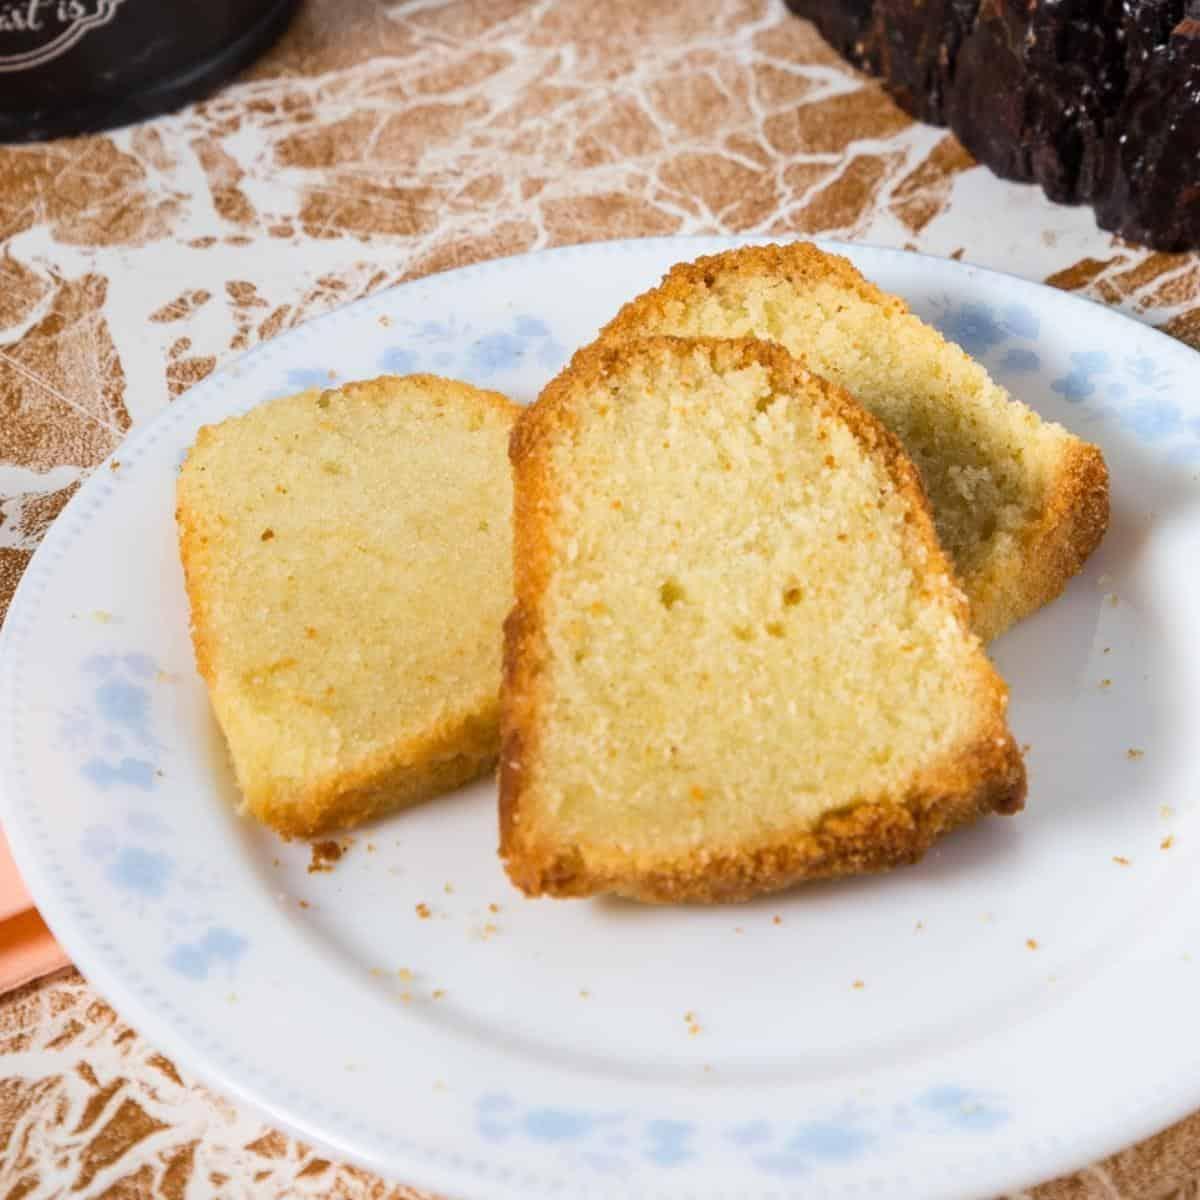 Slices of vanilla bundt cake on a plate.